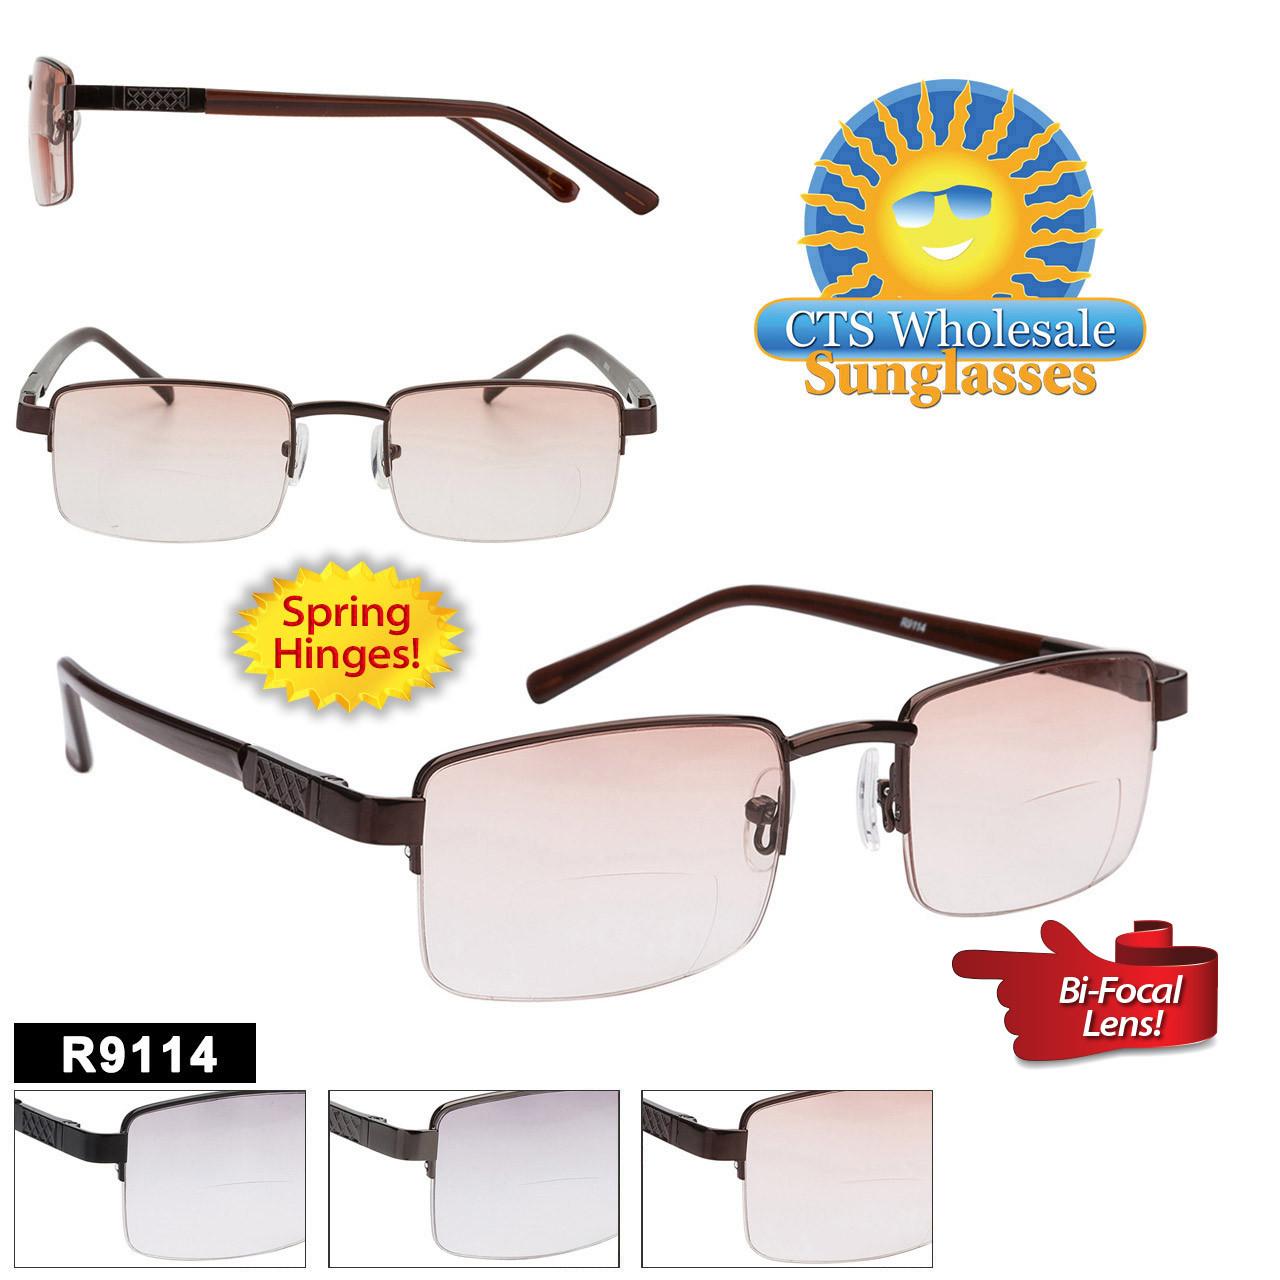 Tinted Bi-Focal Reading Glasses - R9114 Spring Hinges!